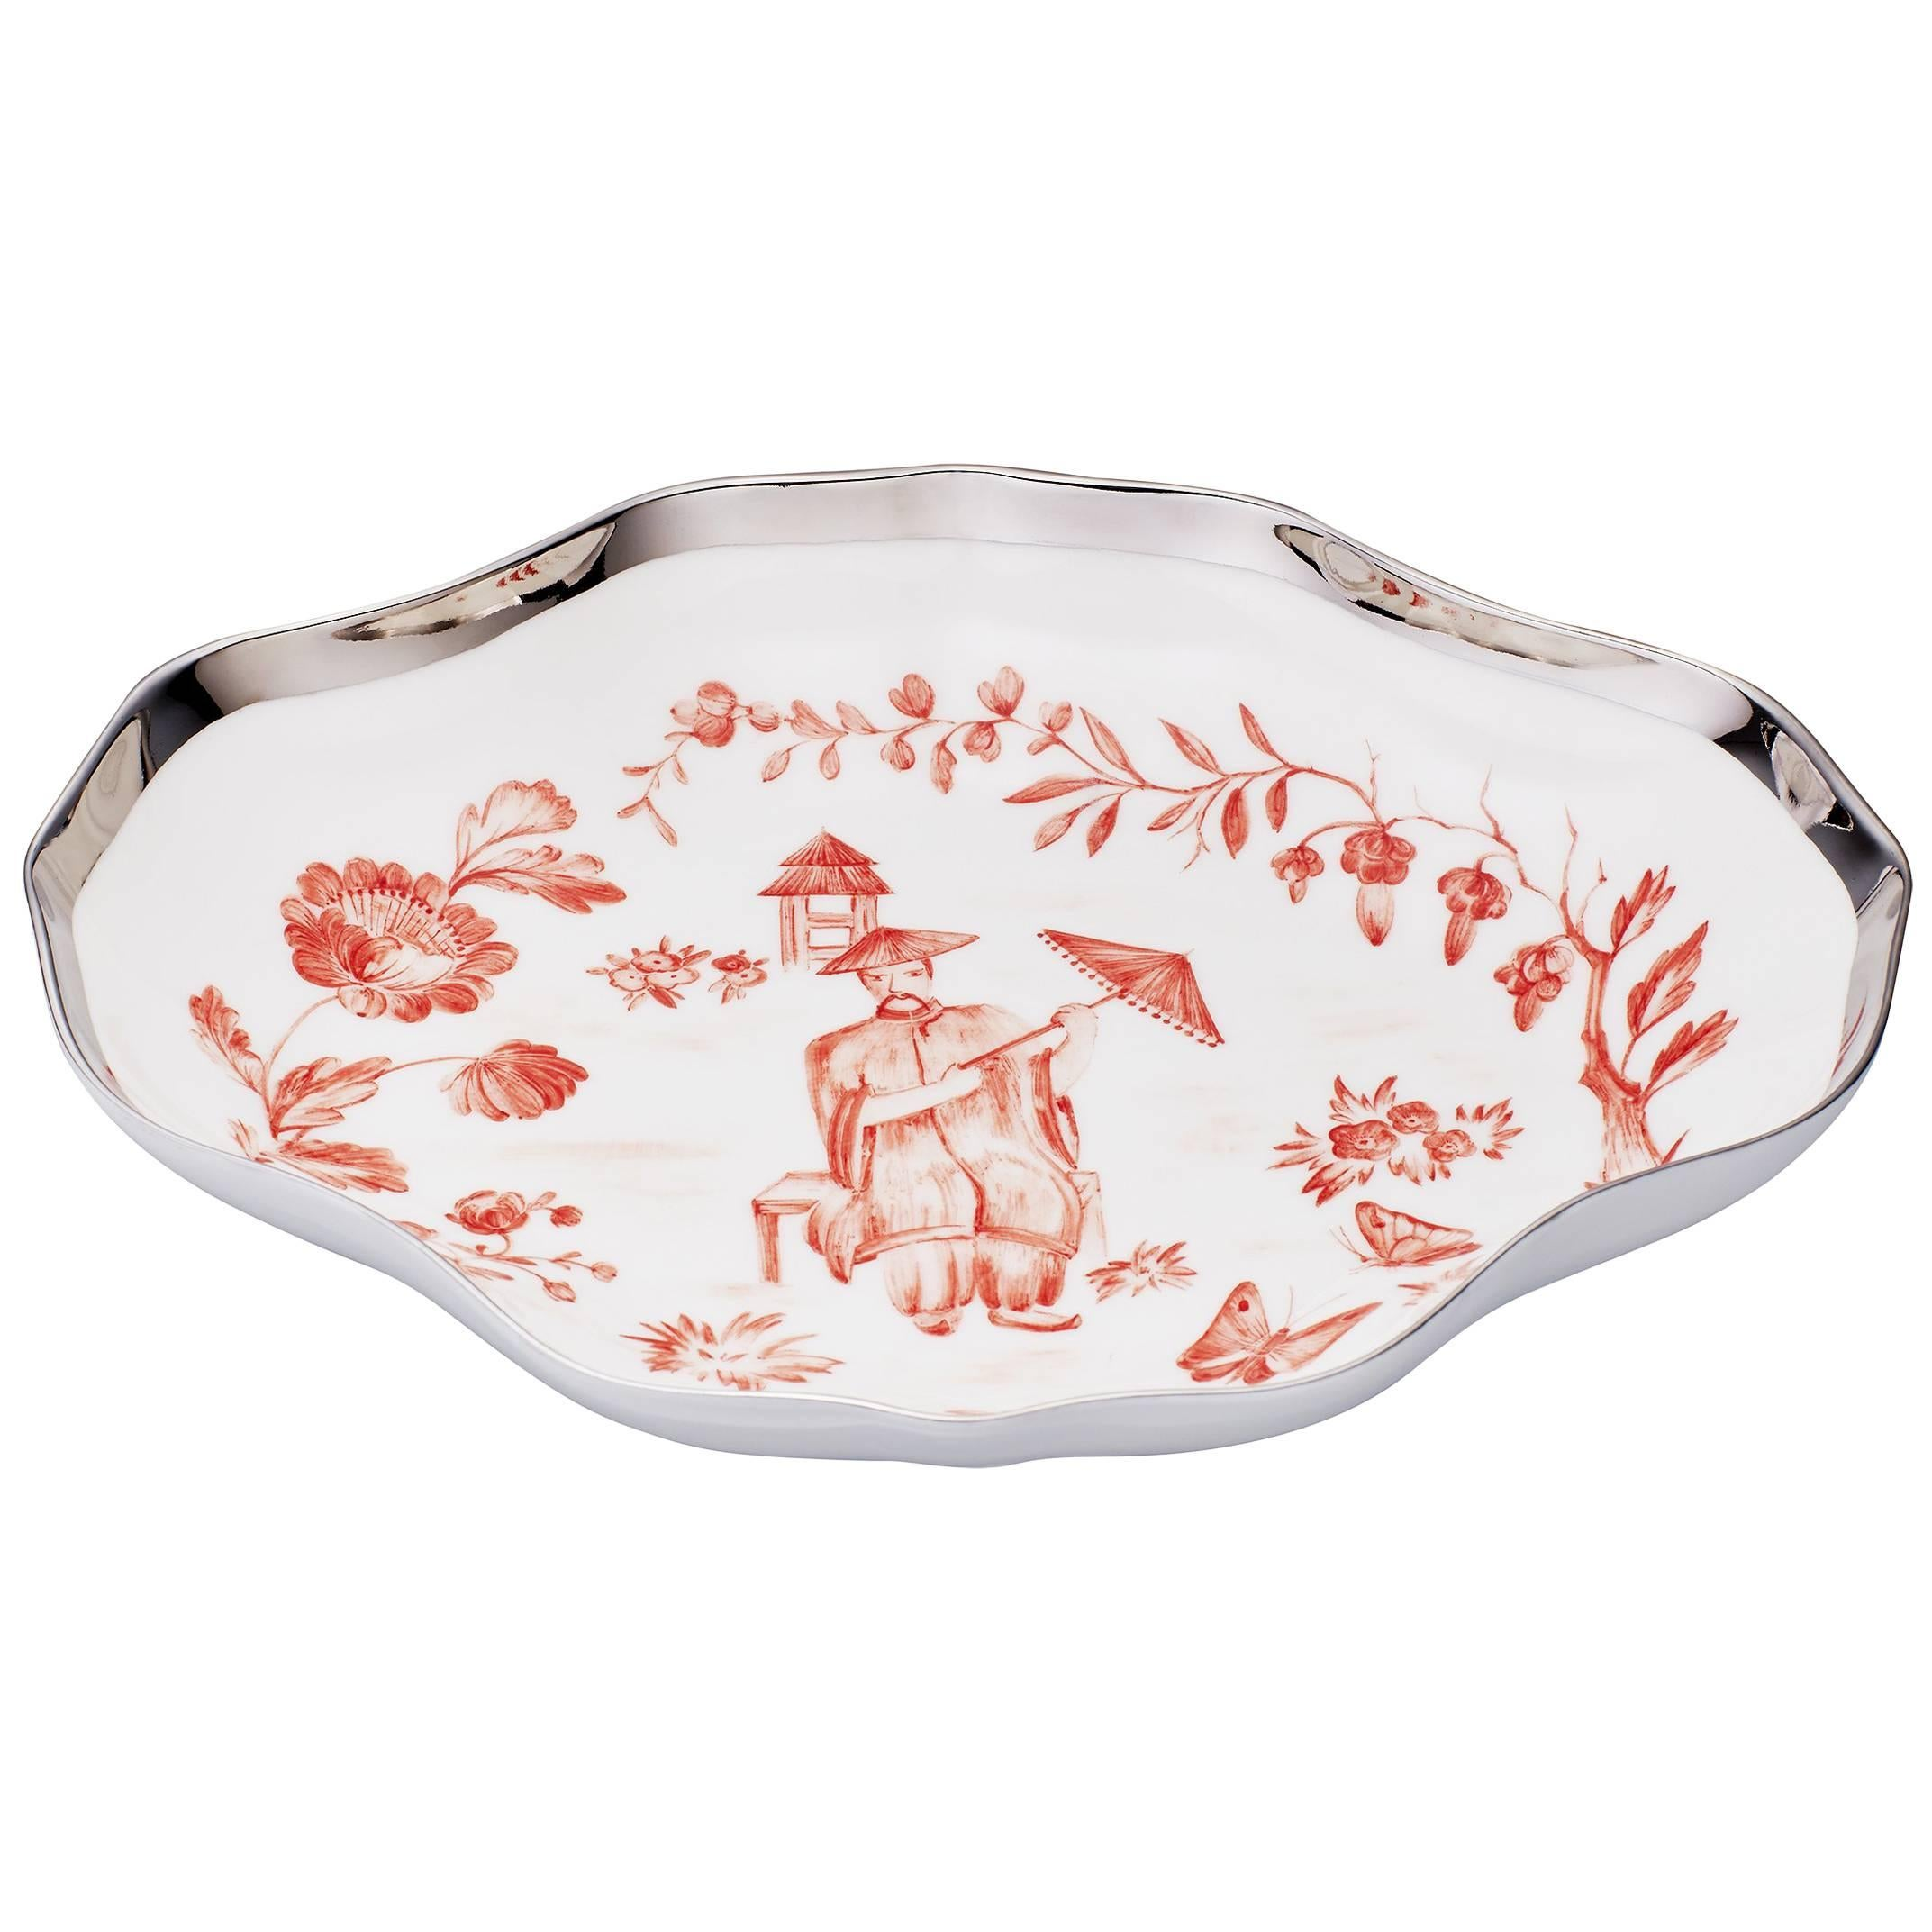 Chinoiserie Handpainted Porcelain Dish Sofina Boutique Kitzbuehel